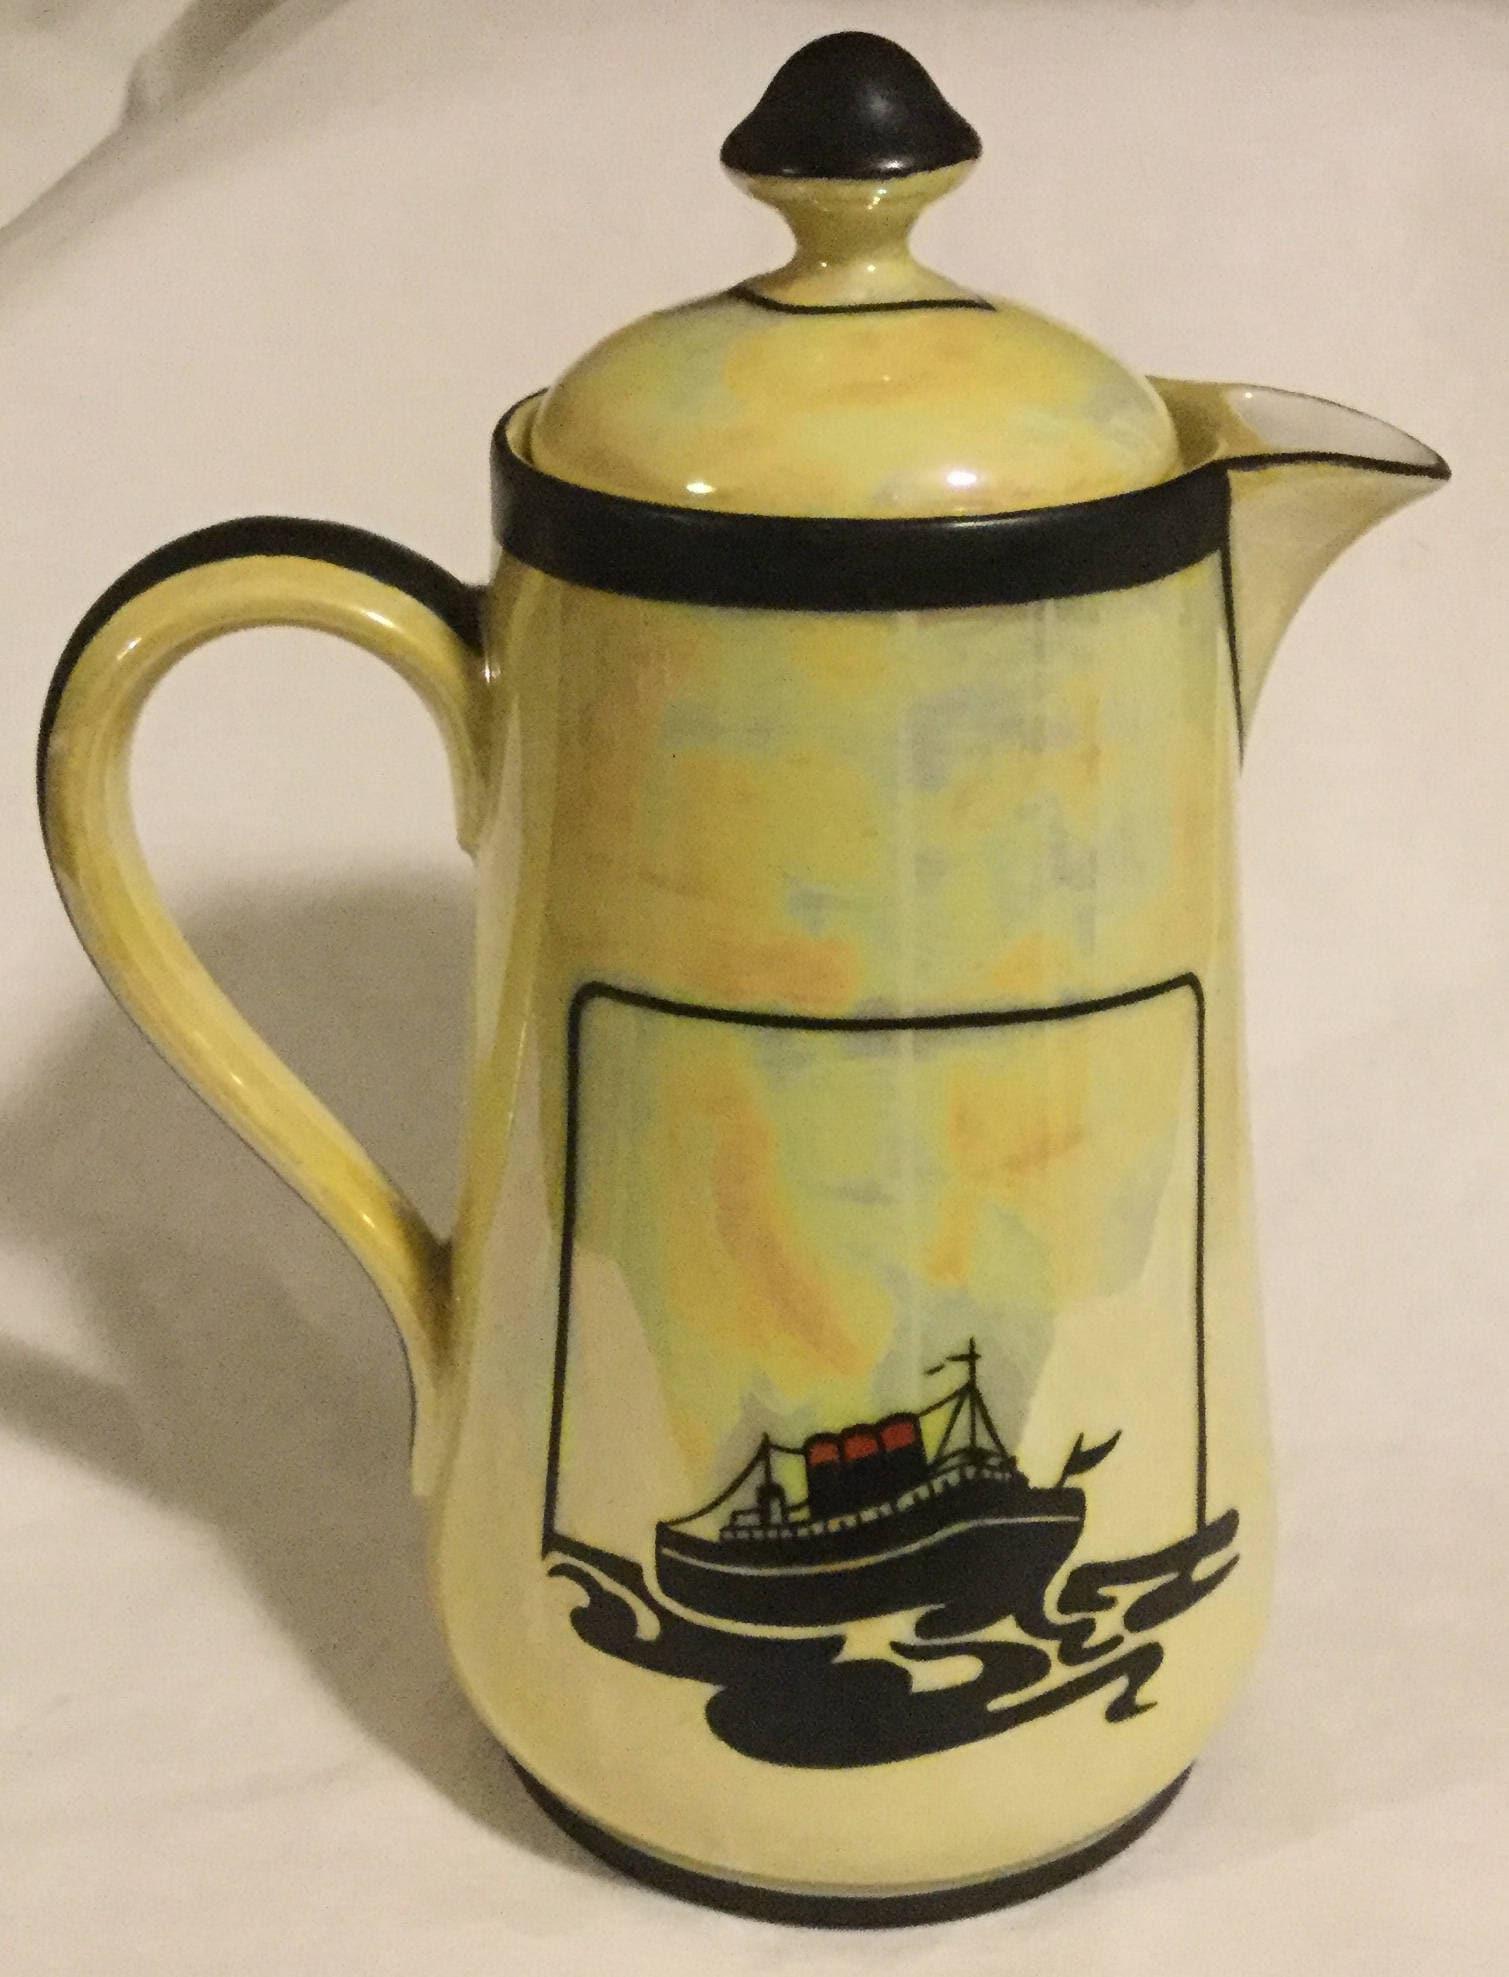 Antique Art Deco French Lusterware Ocean Liner Teapot